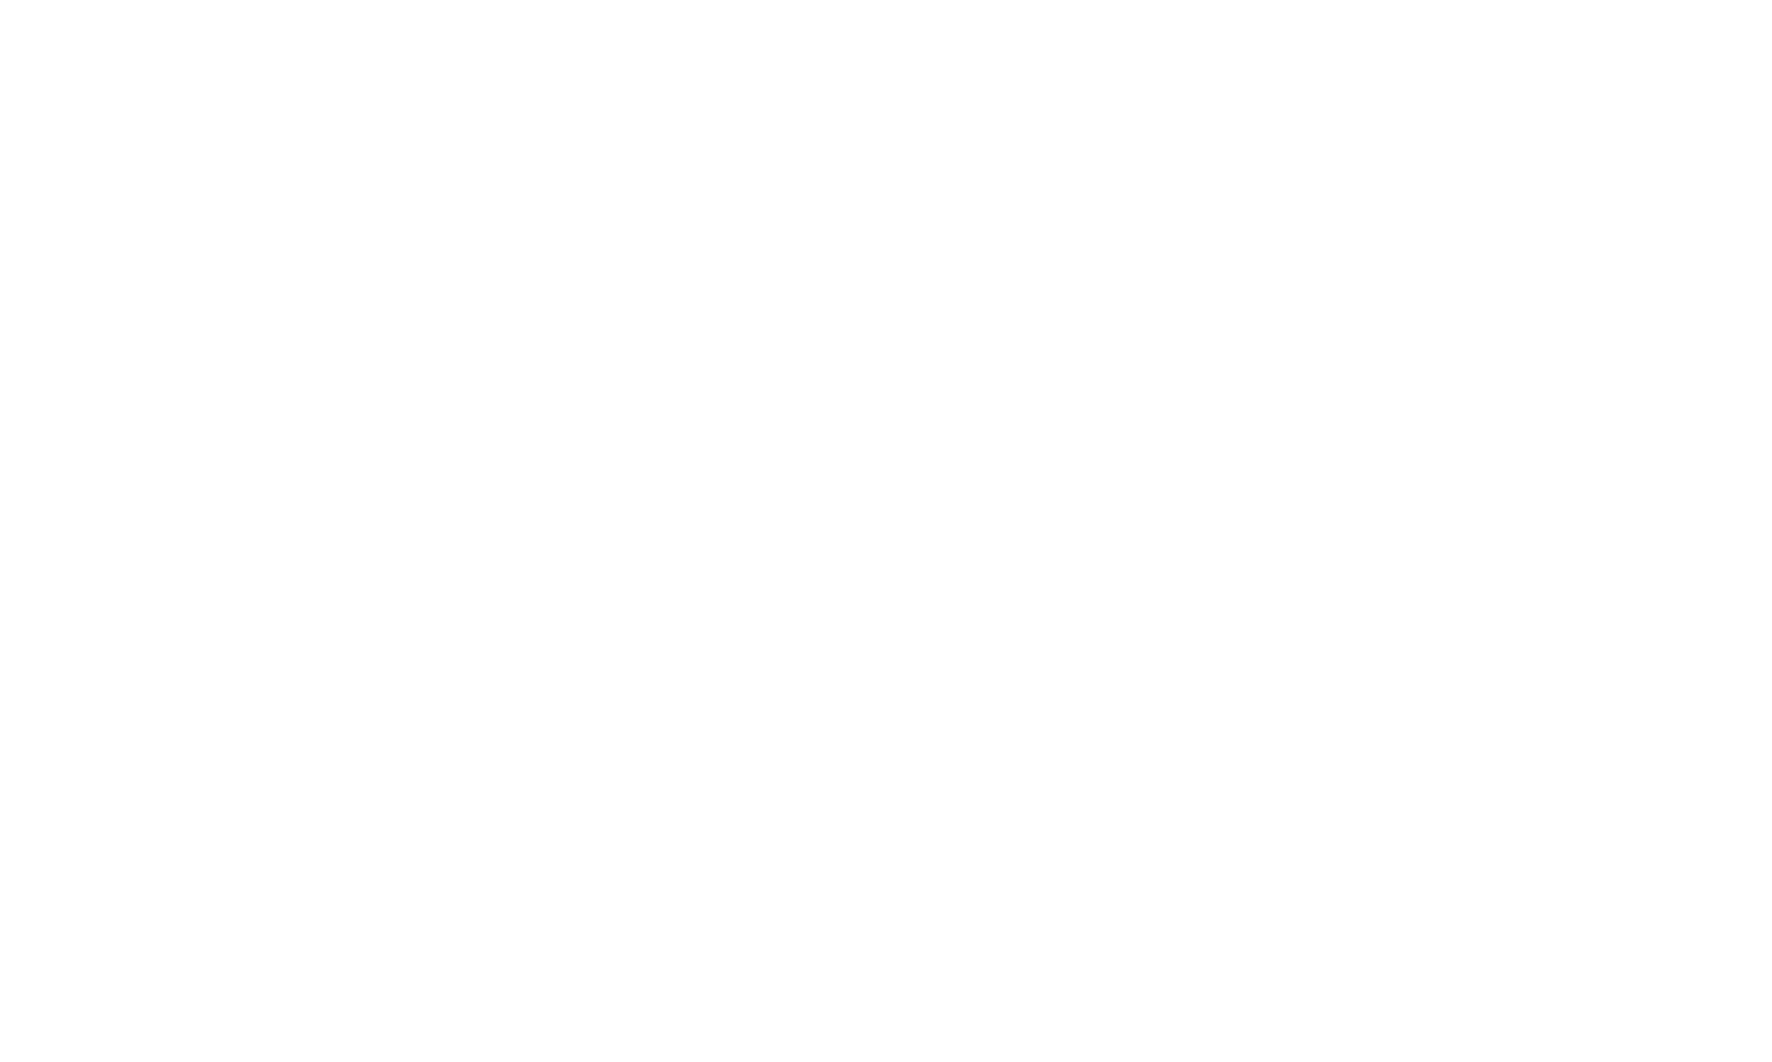 Vliesbehang